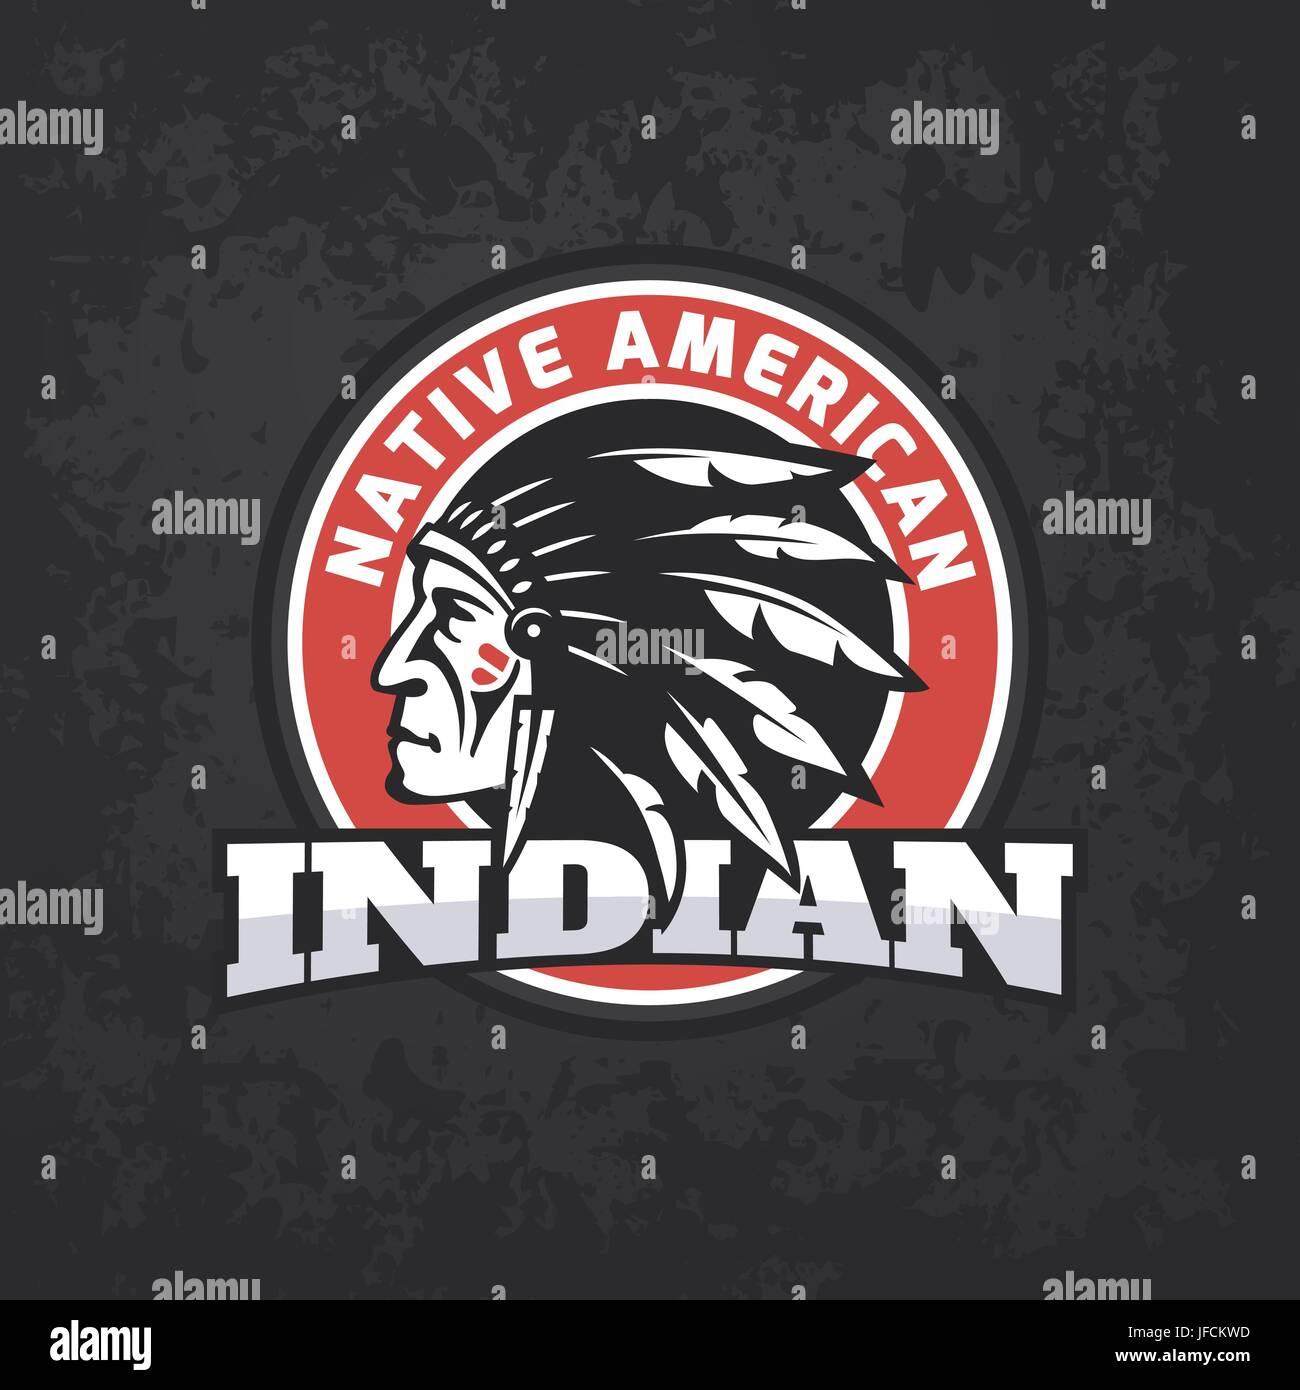 Round American Indian logo on dark grunge background. Tee print design - Stock Image